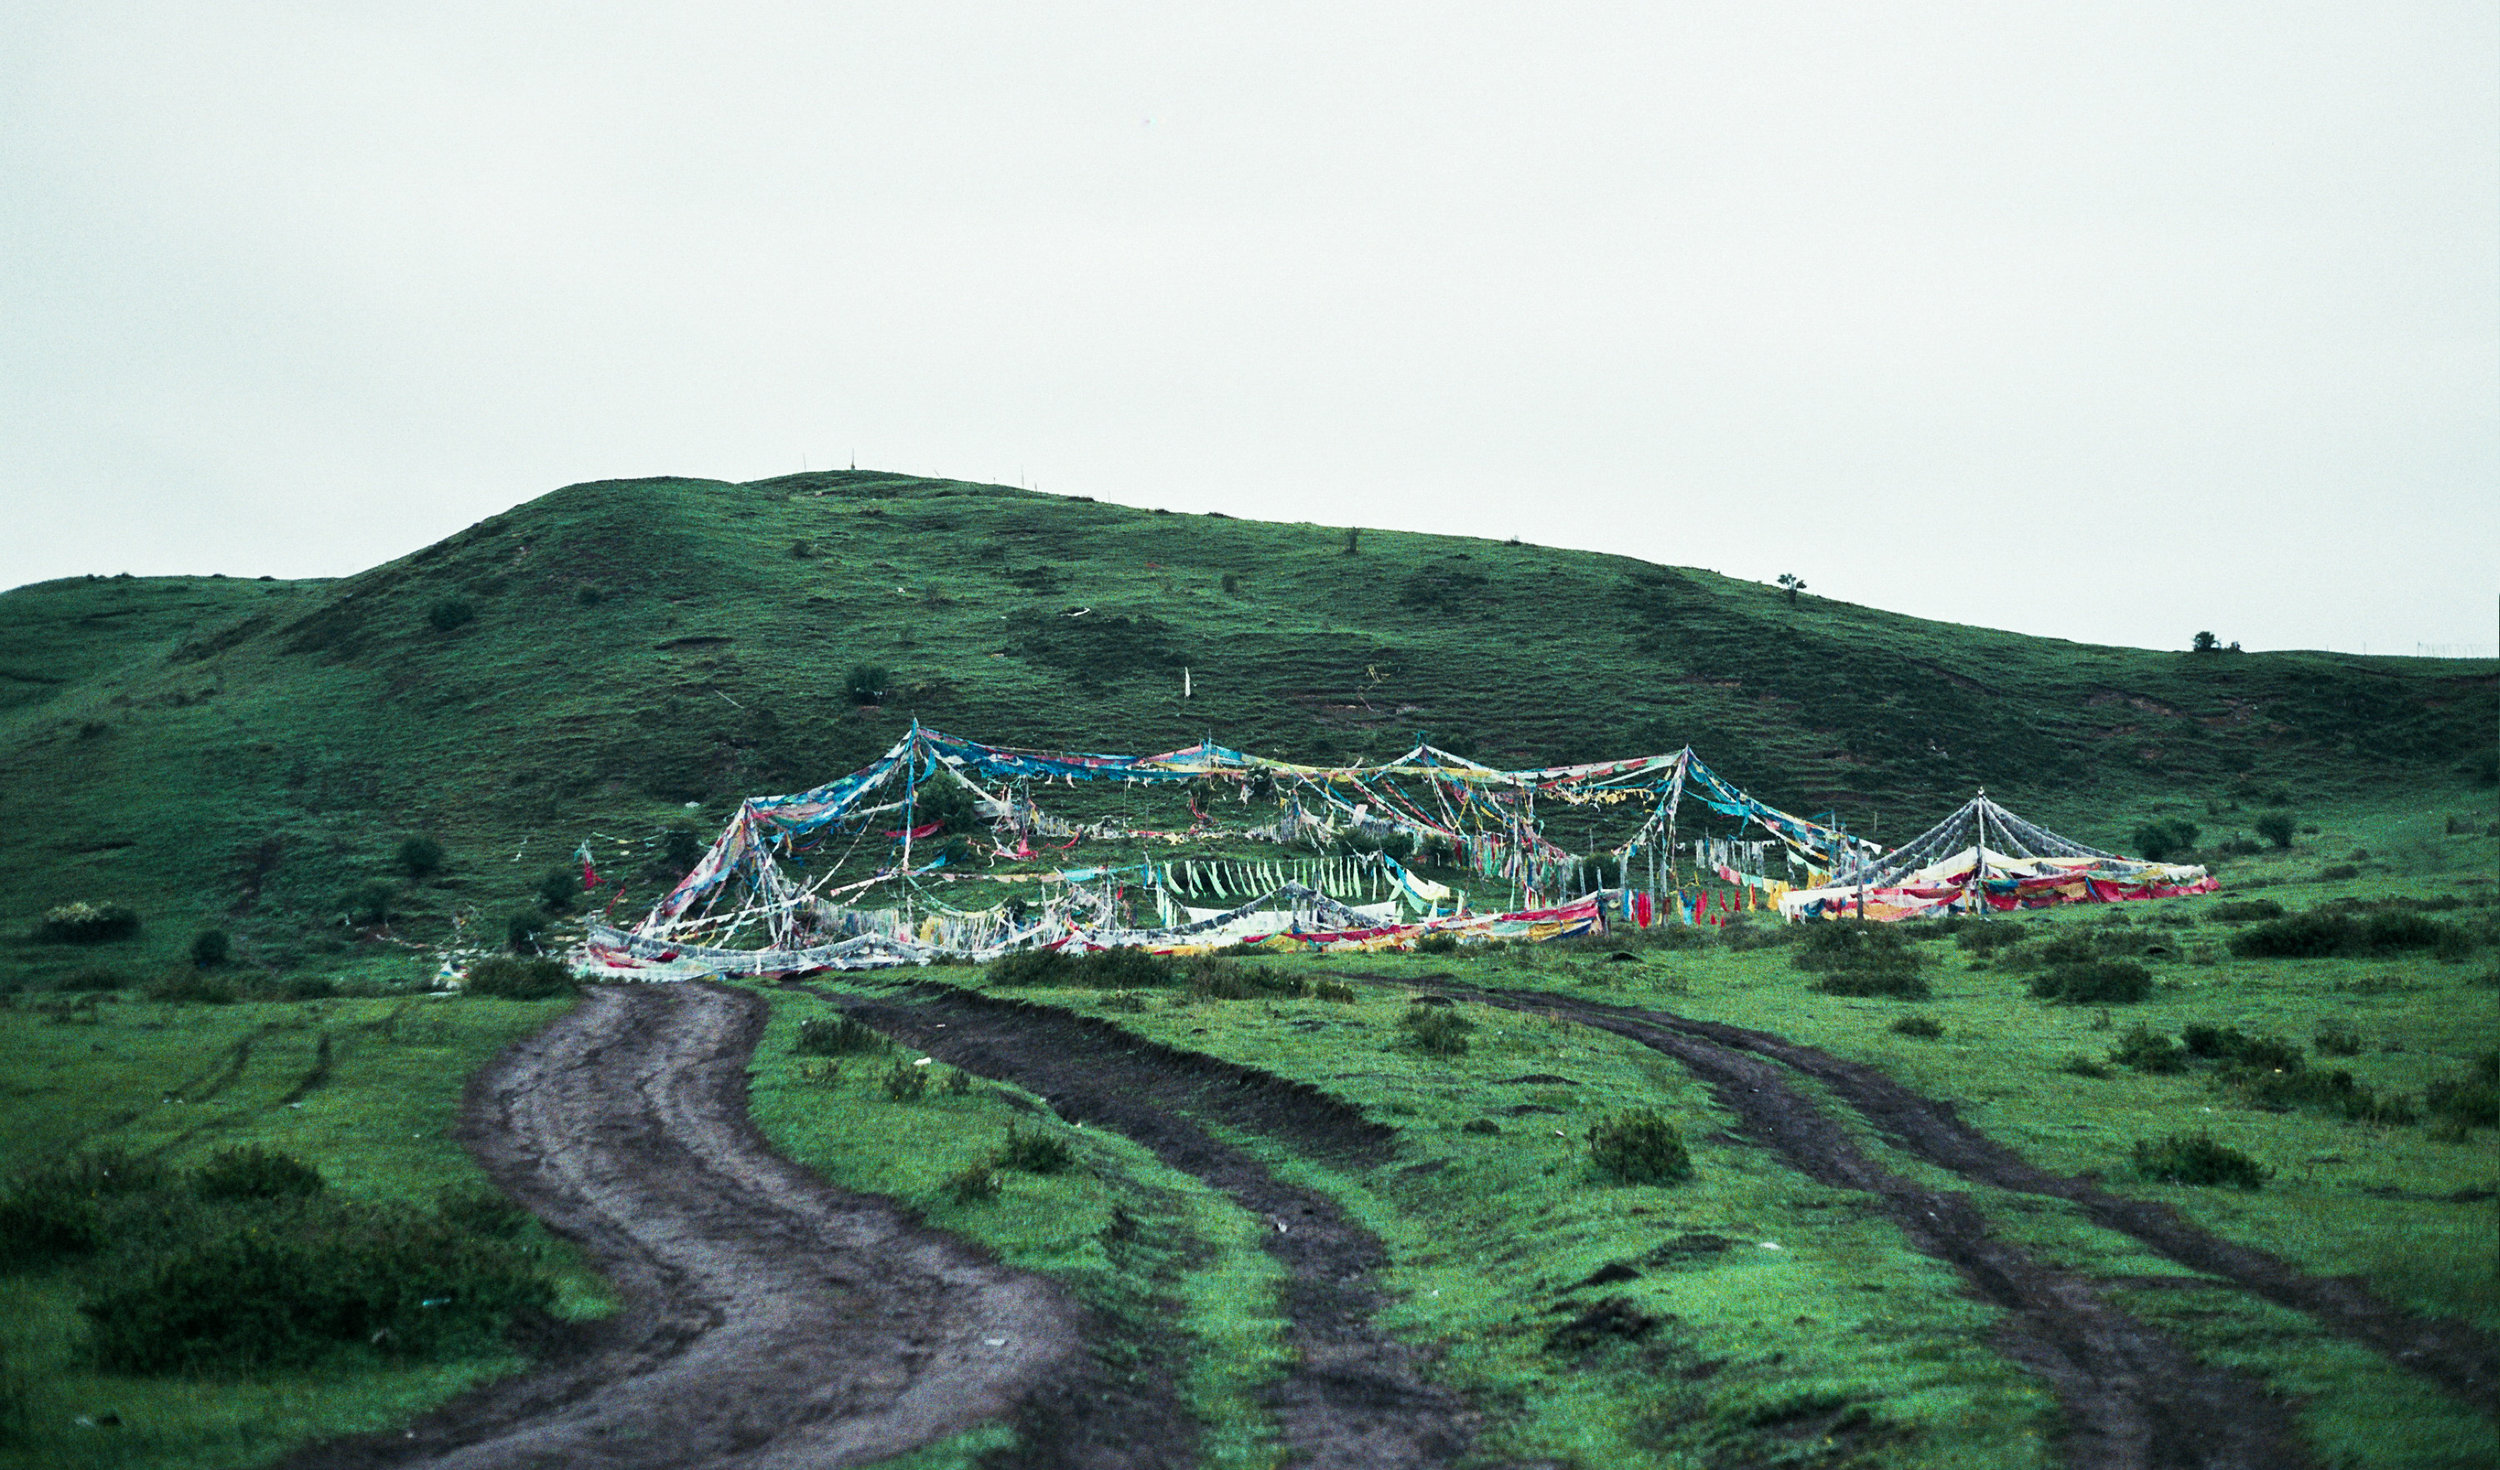 Sky Burial Site, Langmusi, Gansu Province, China